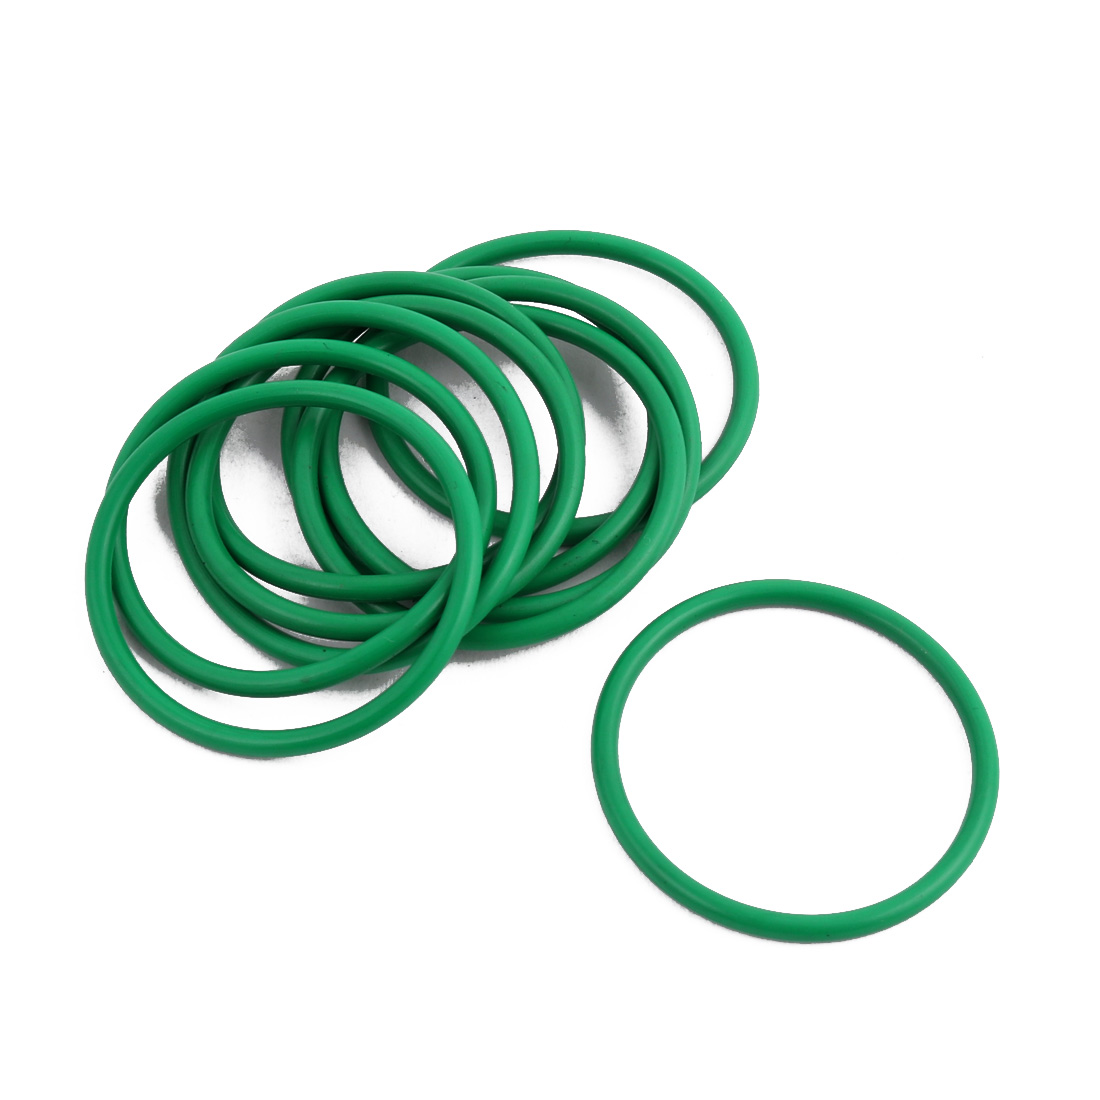 10Pcs Green 30 x 1.9mm Industrial Flexible Rubber O Ring Oil Sealing Grommets